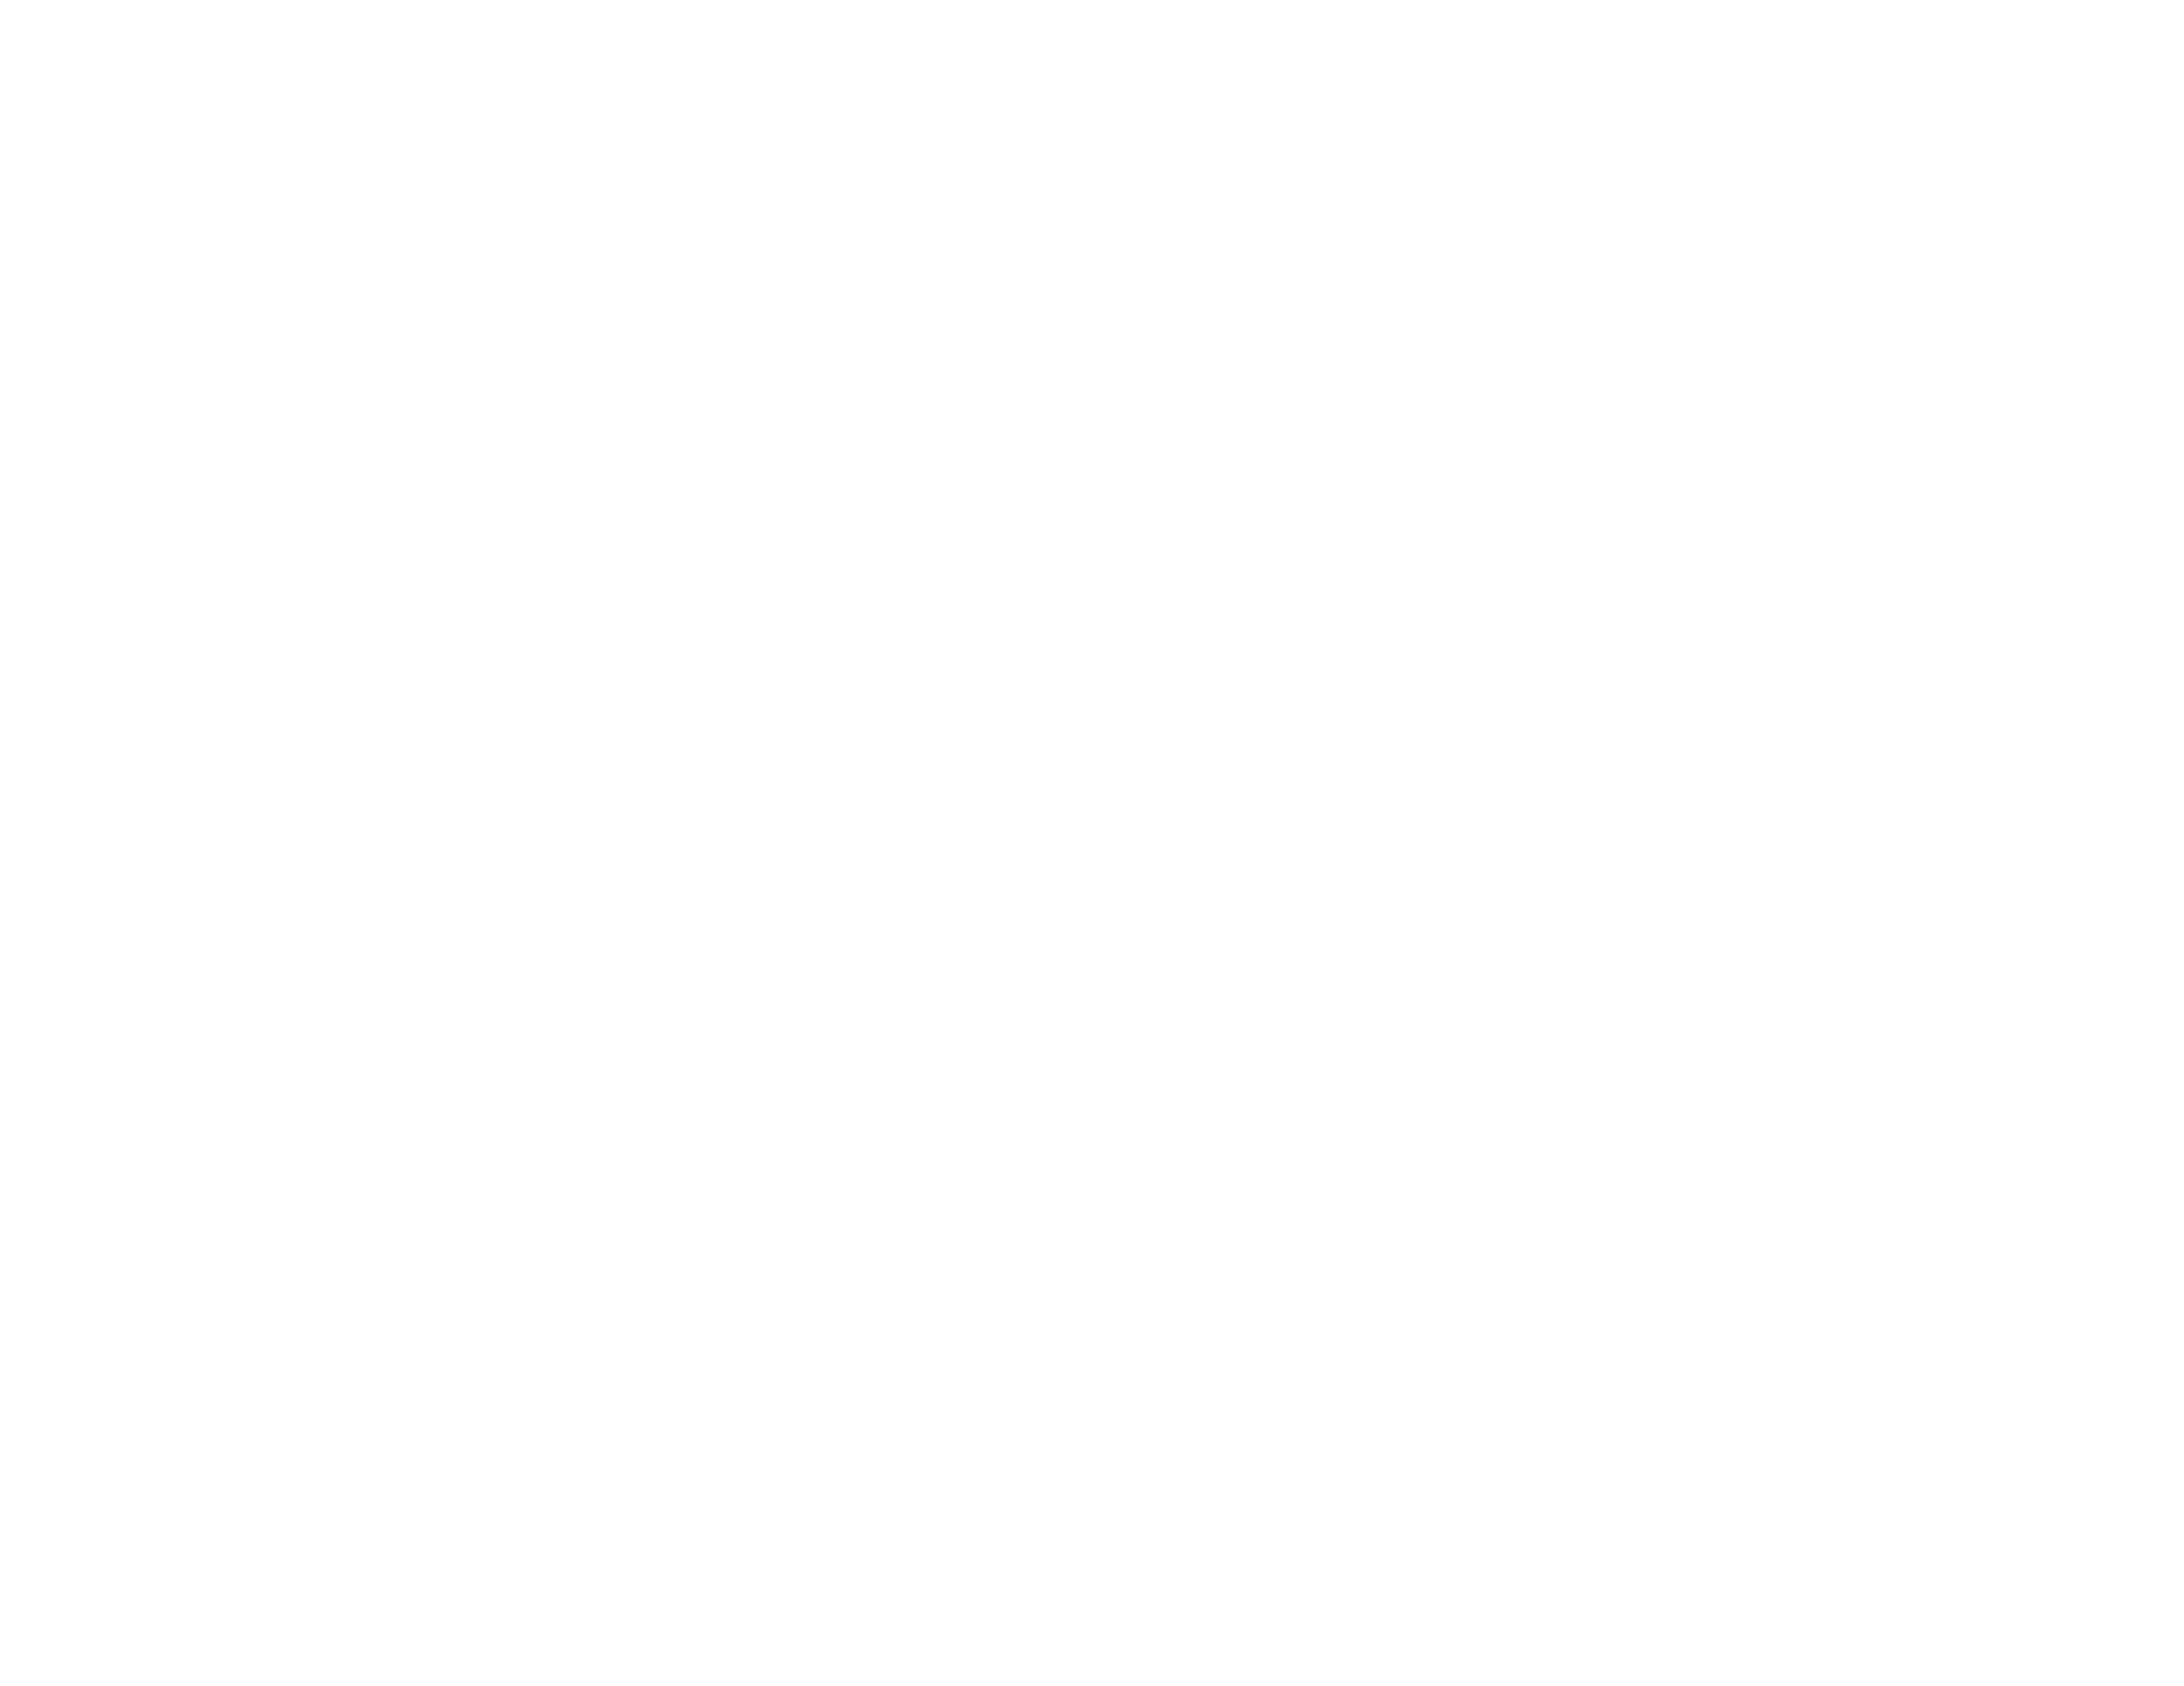 004_dommedia-LOGO_WHITE